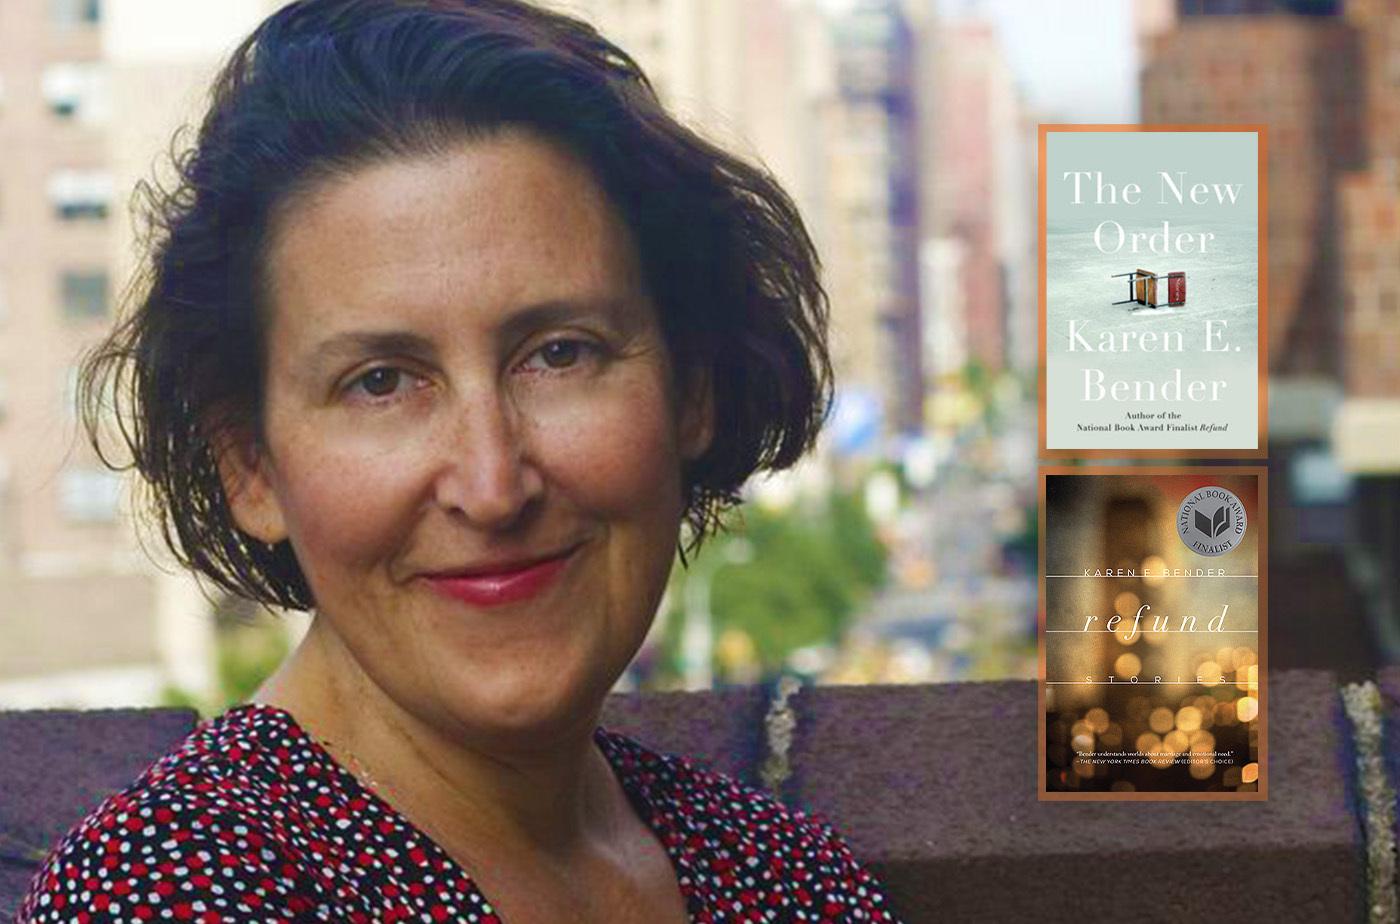 Catapult online classes: Karen E.  Bender, 2-Day Online Fiction Intensive: Finding Your Story, Fiction, Intensive